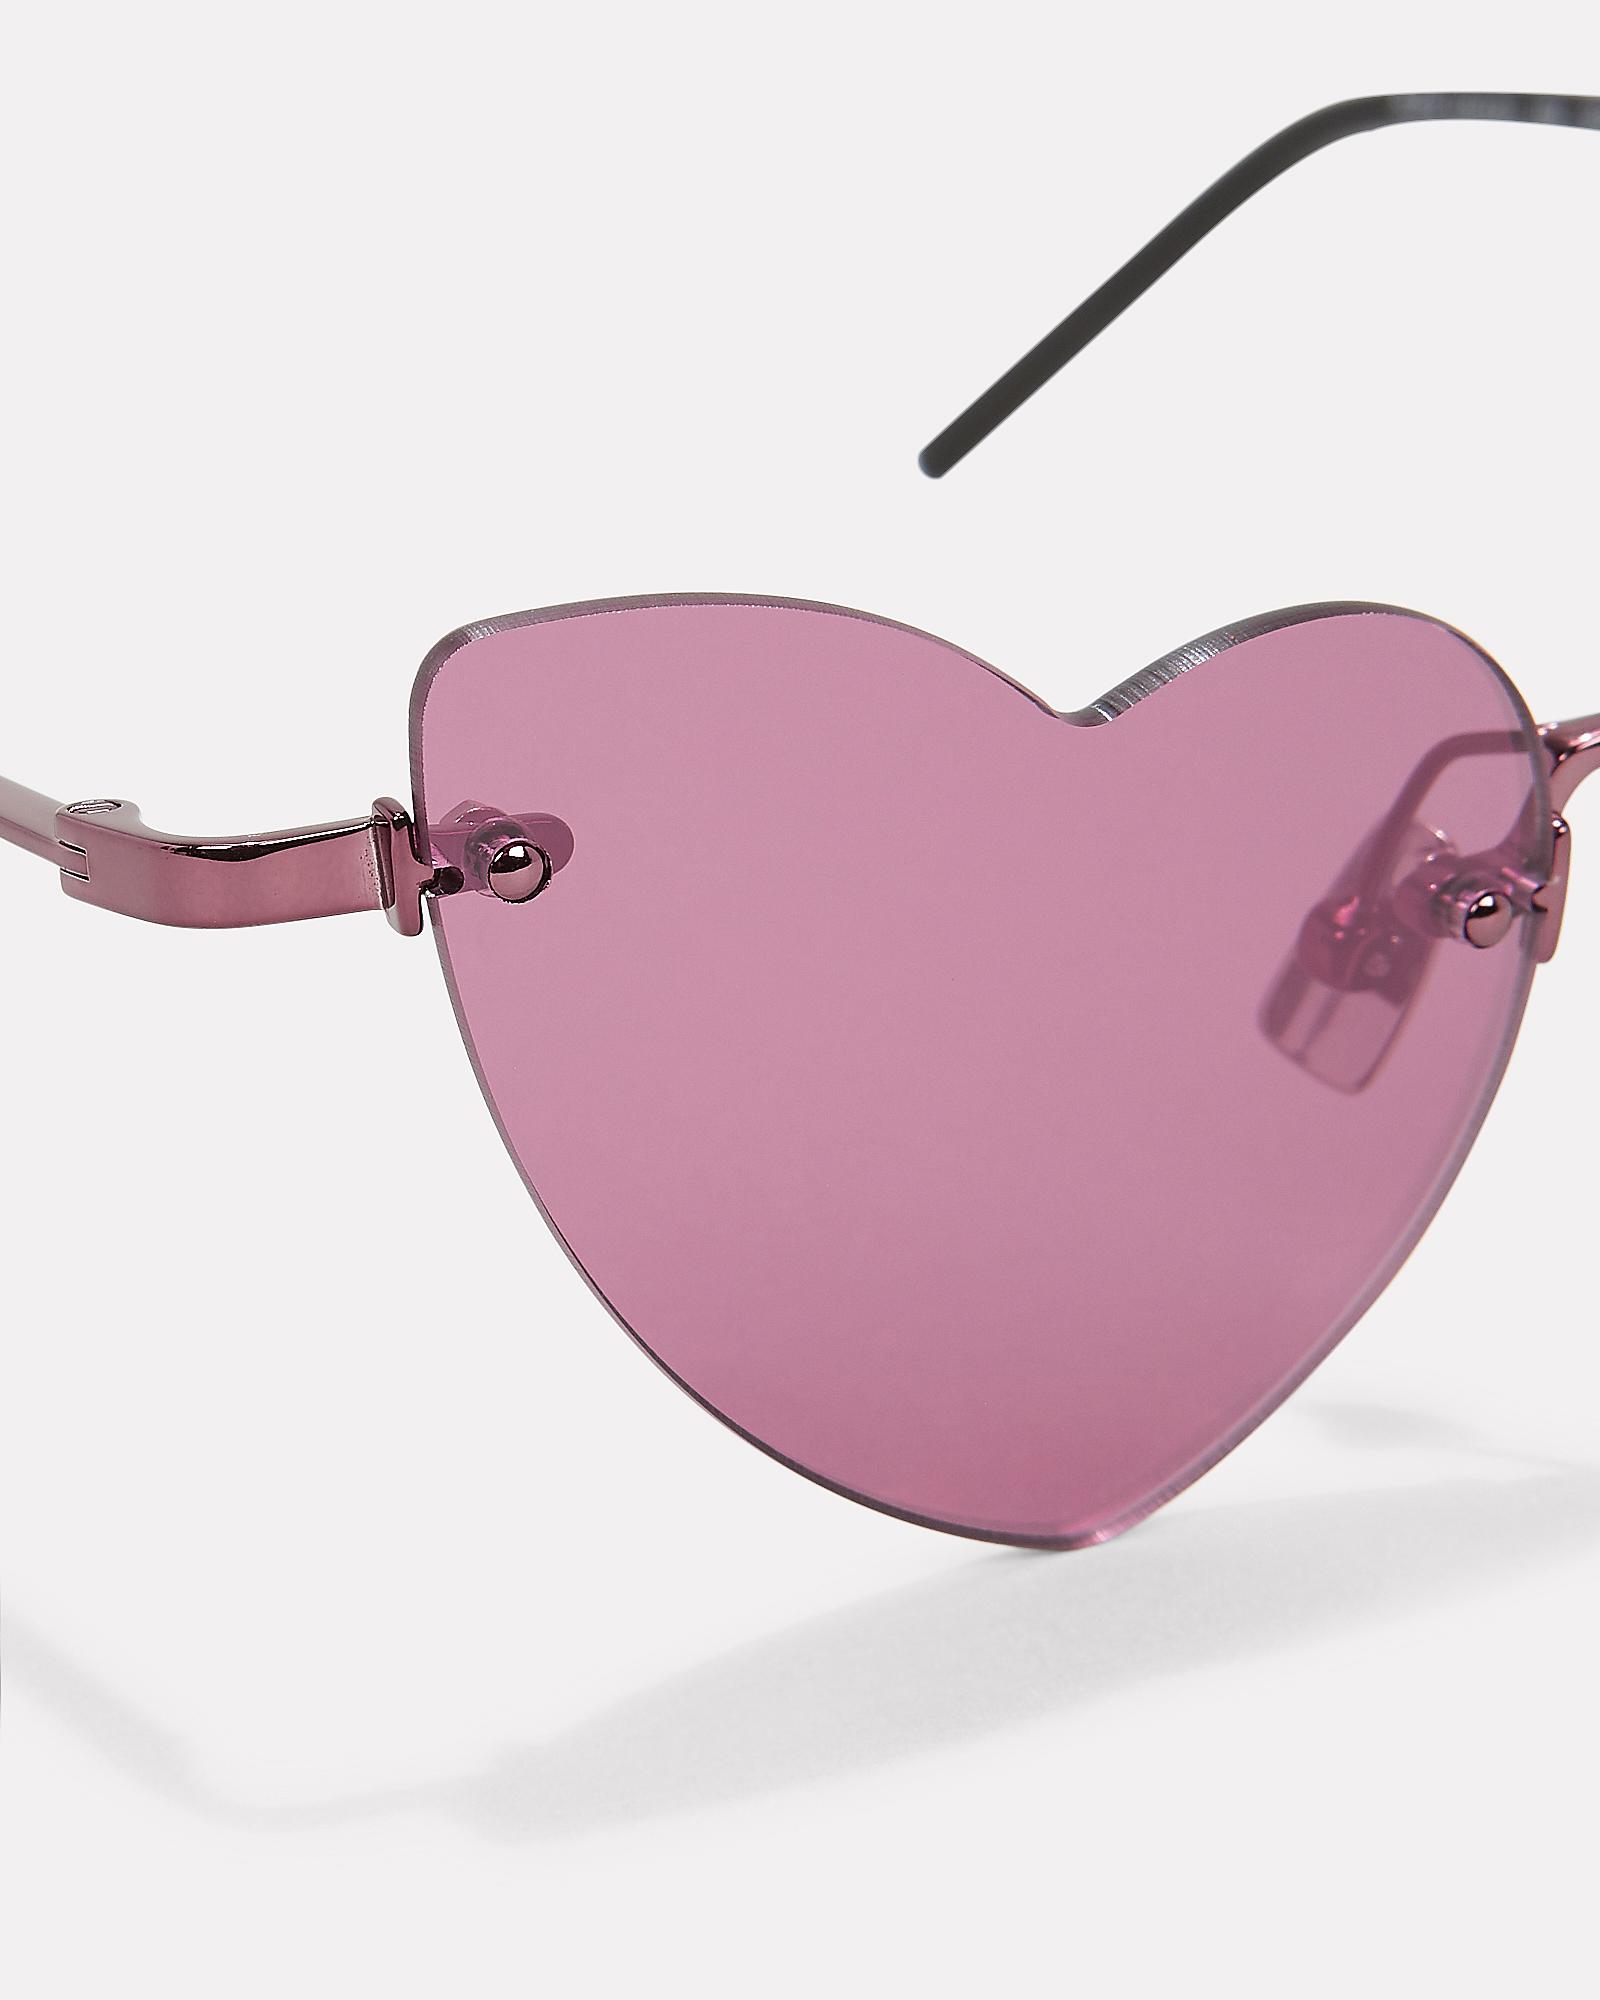 38cfc4a1b7 ... Loulou Rimless Heart Sunglasses